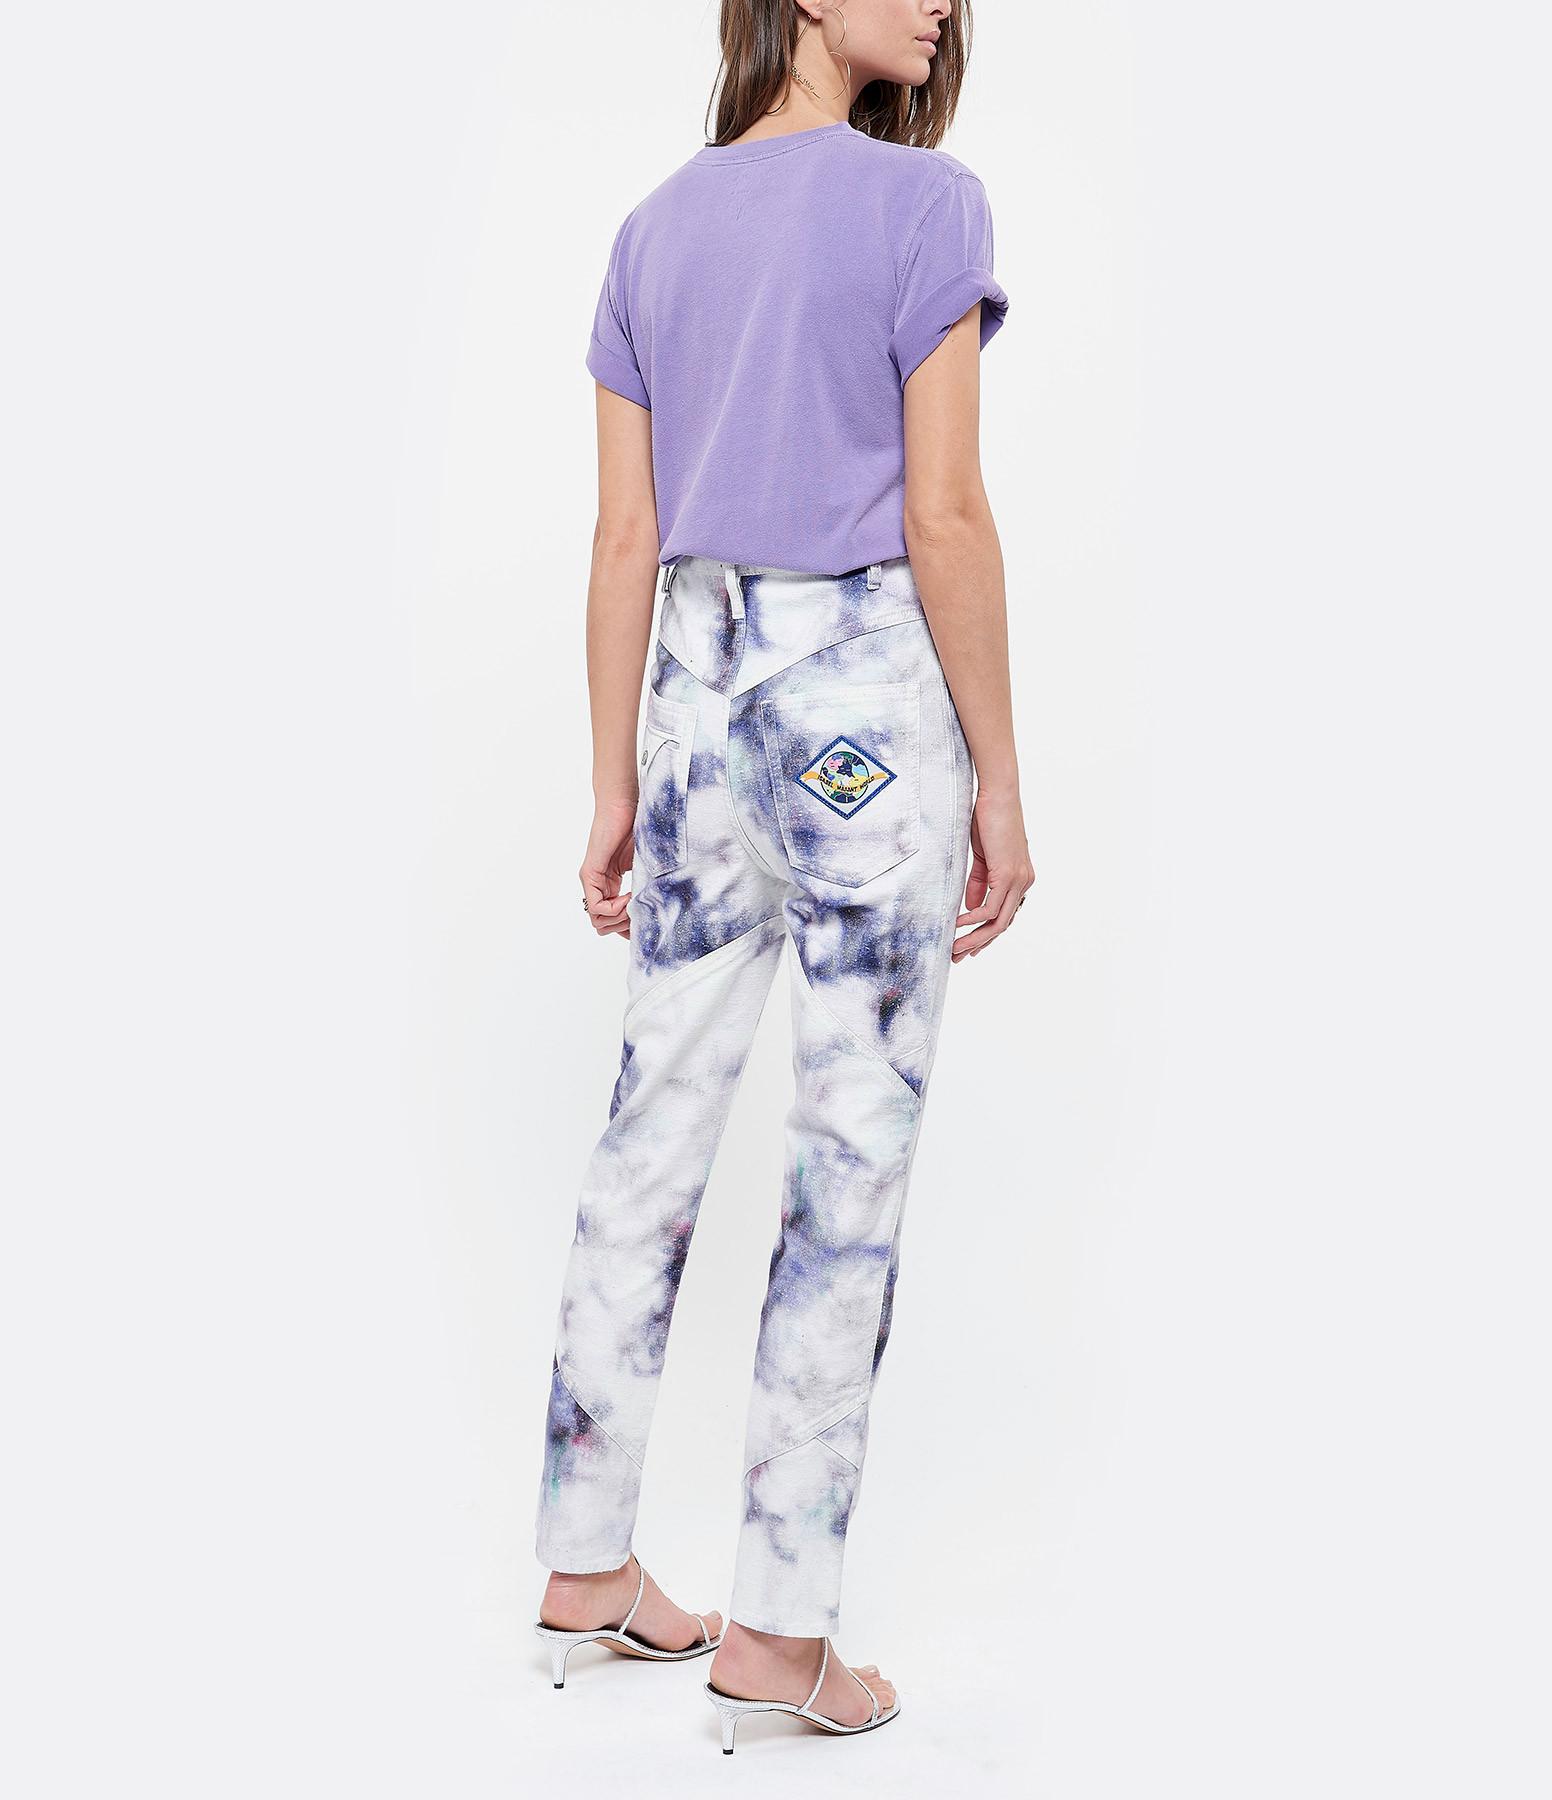 NEWTONE - Tee-shirt Phoenix Coton Violet